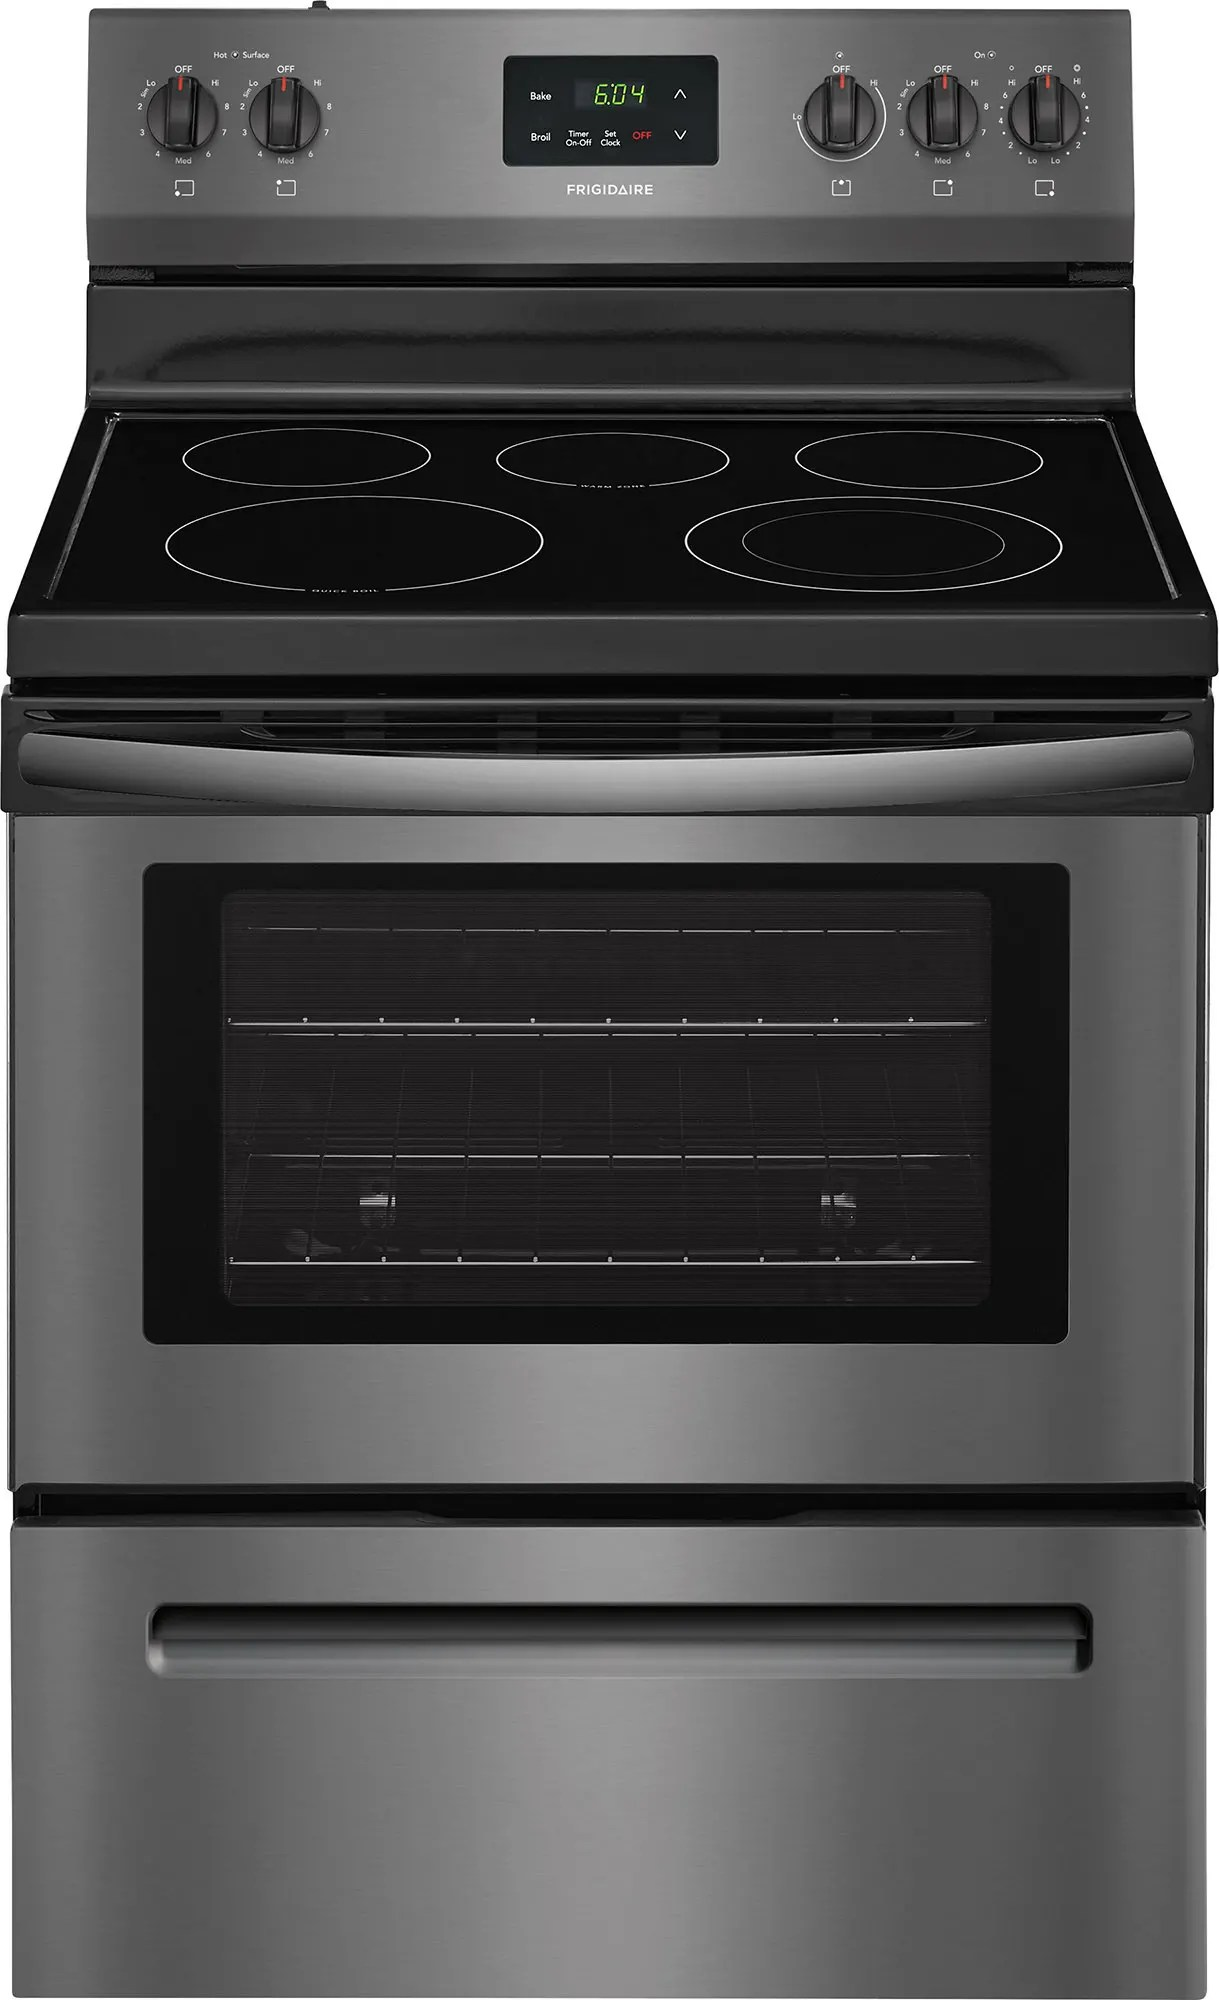 electric stove cat 5e vs 6 wiring diagram frigidaire ffef3052td 30 inch freestanding range